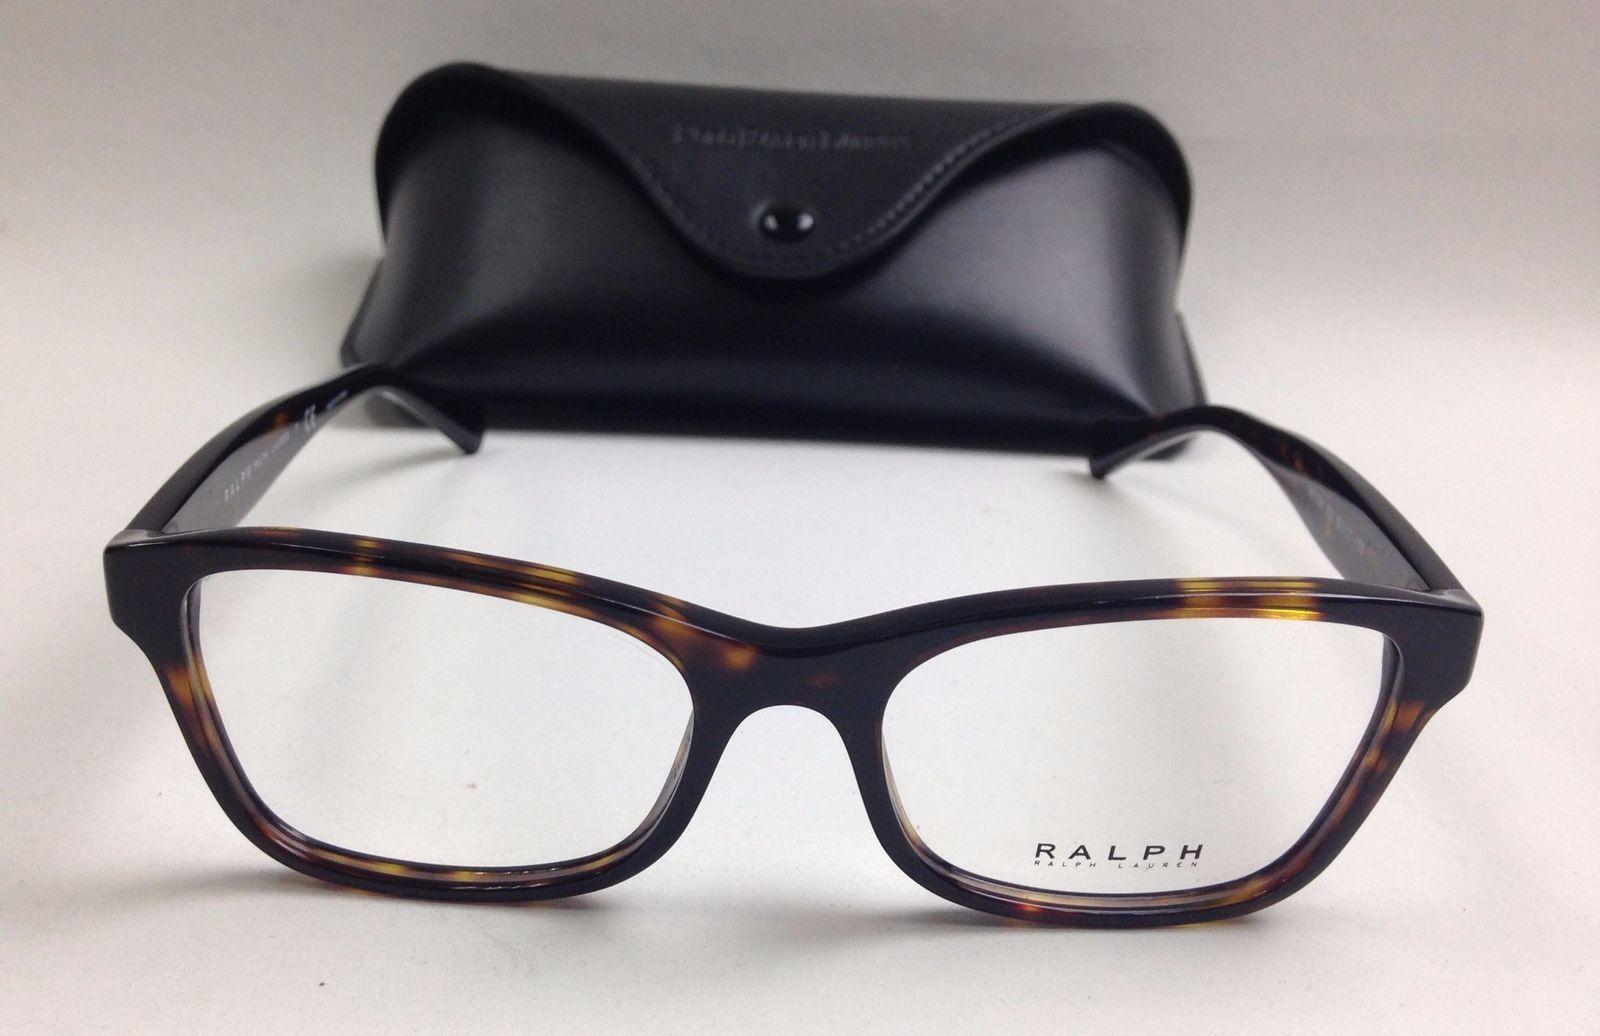 40a8f56205 Ralph Lauren RA7074 502 Eyeglasses 50 17 135 and 50 similar items